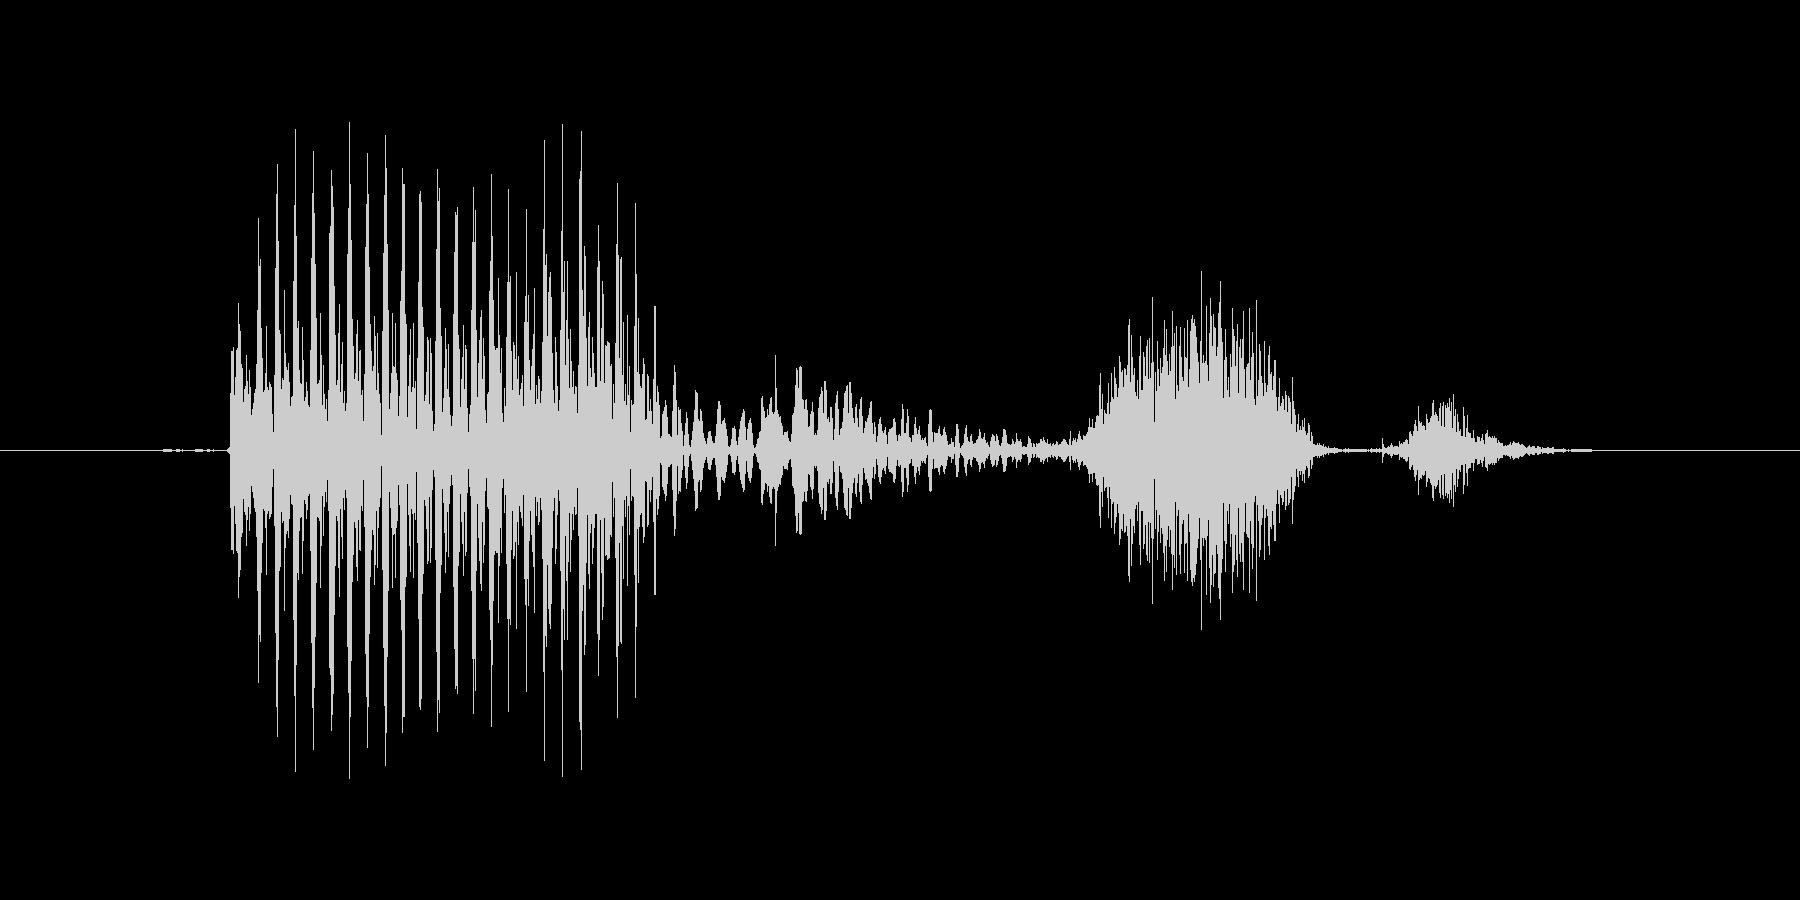 「August」英語発音の未再生の波形